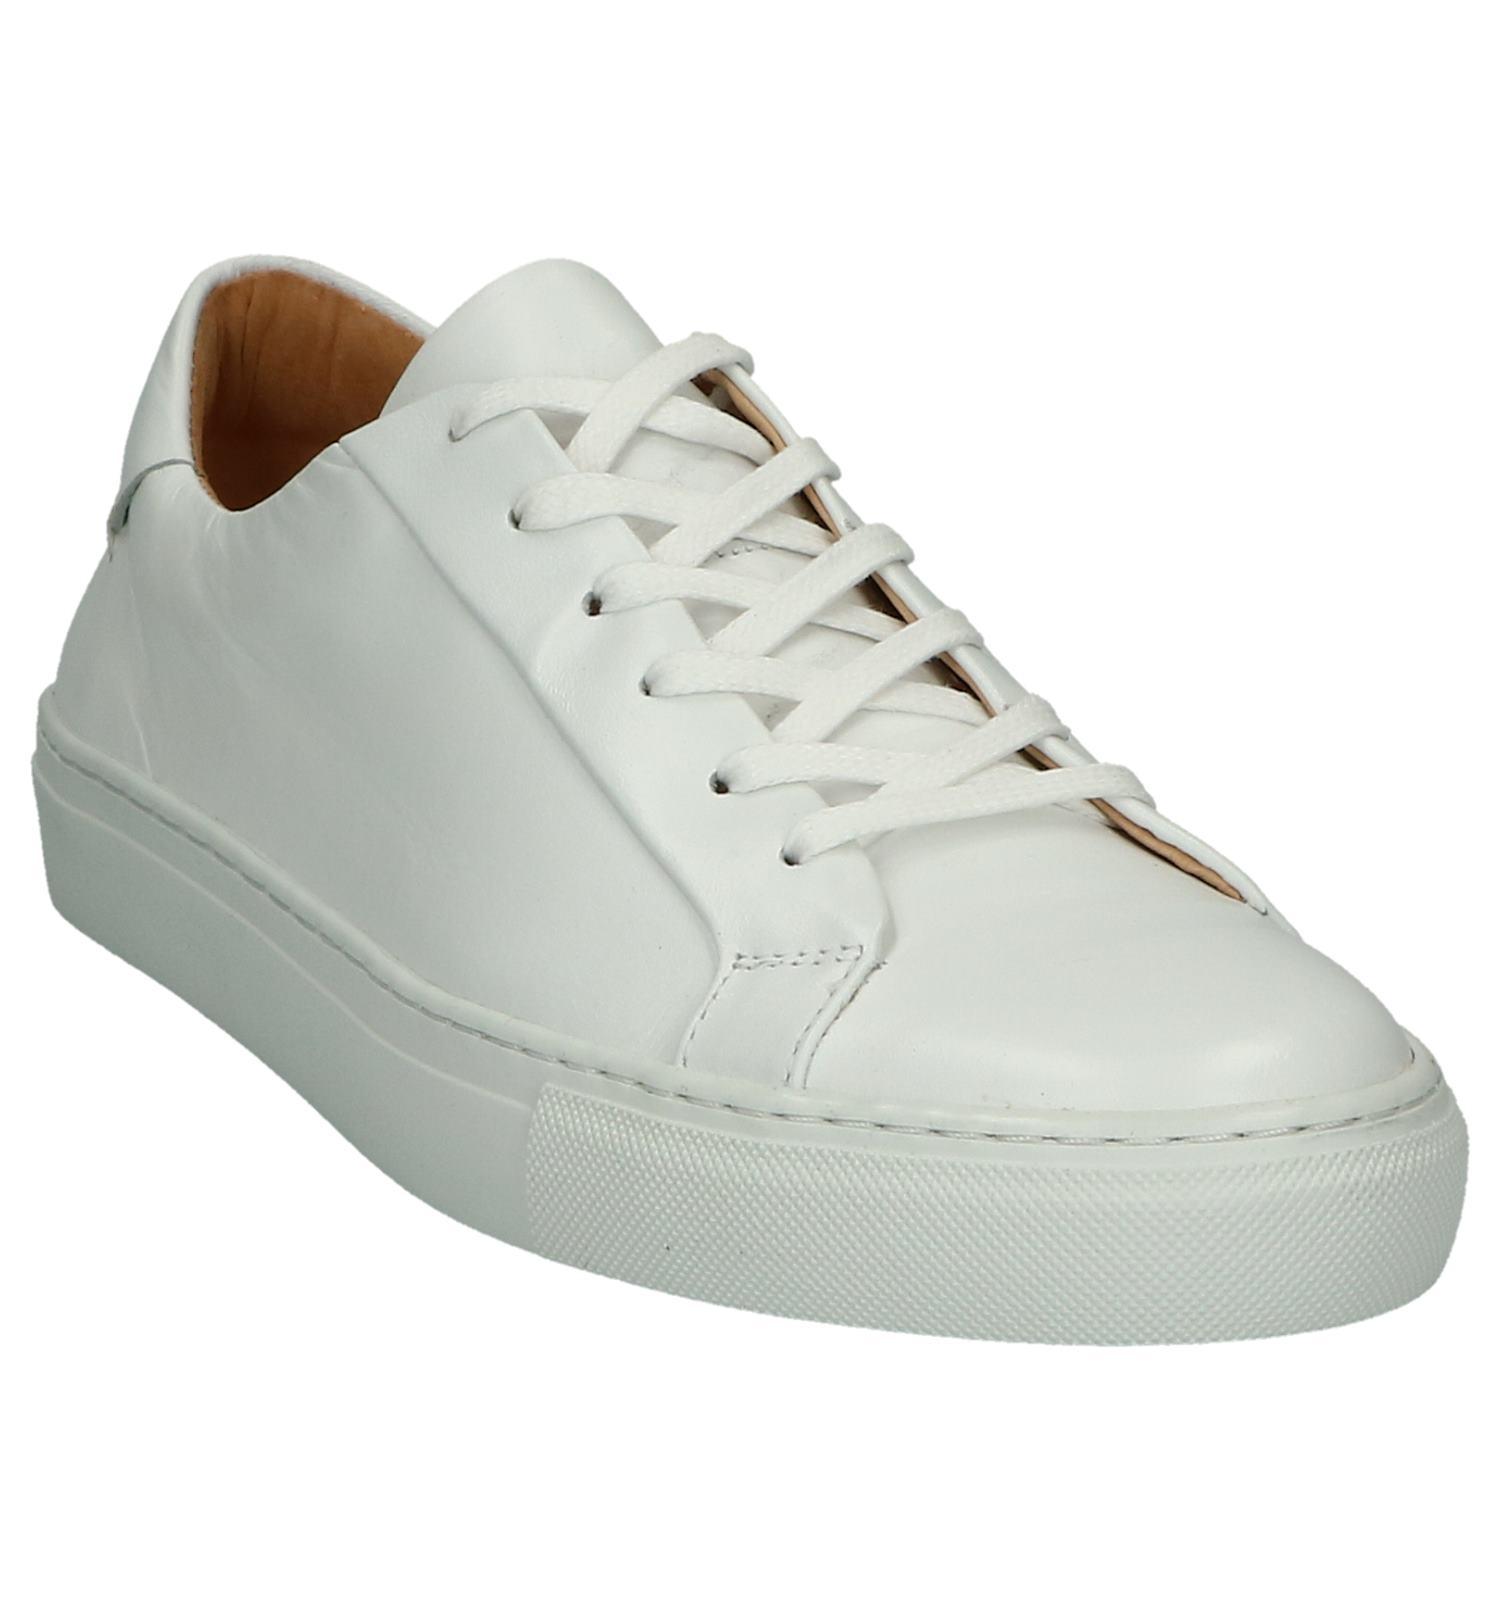 Scapa Witte Lage Witte Lage Sneaker Sneaker PZkTliuwOX